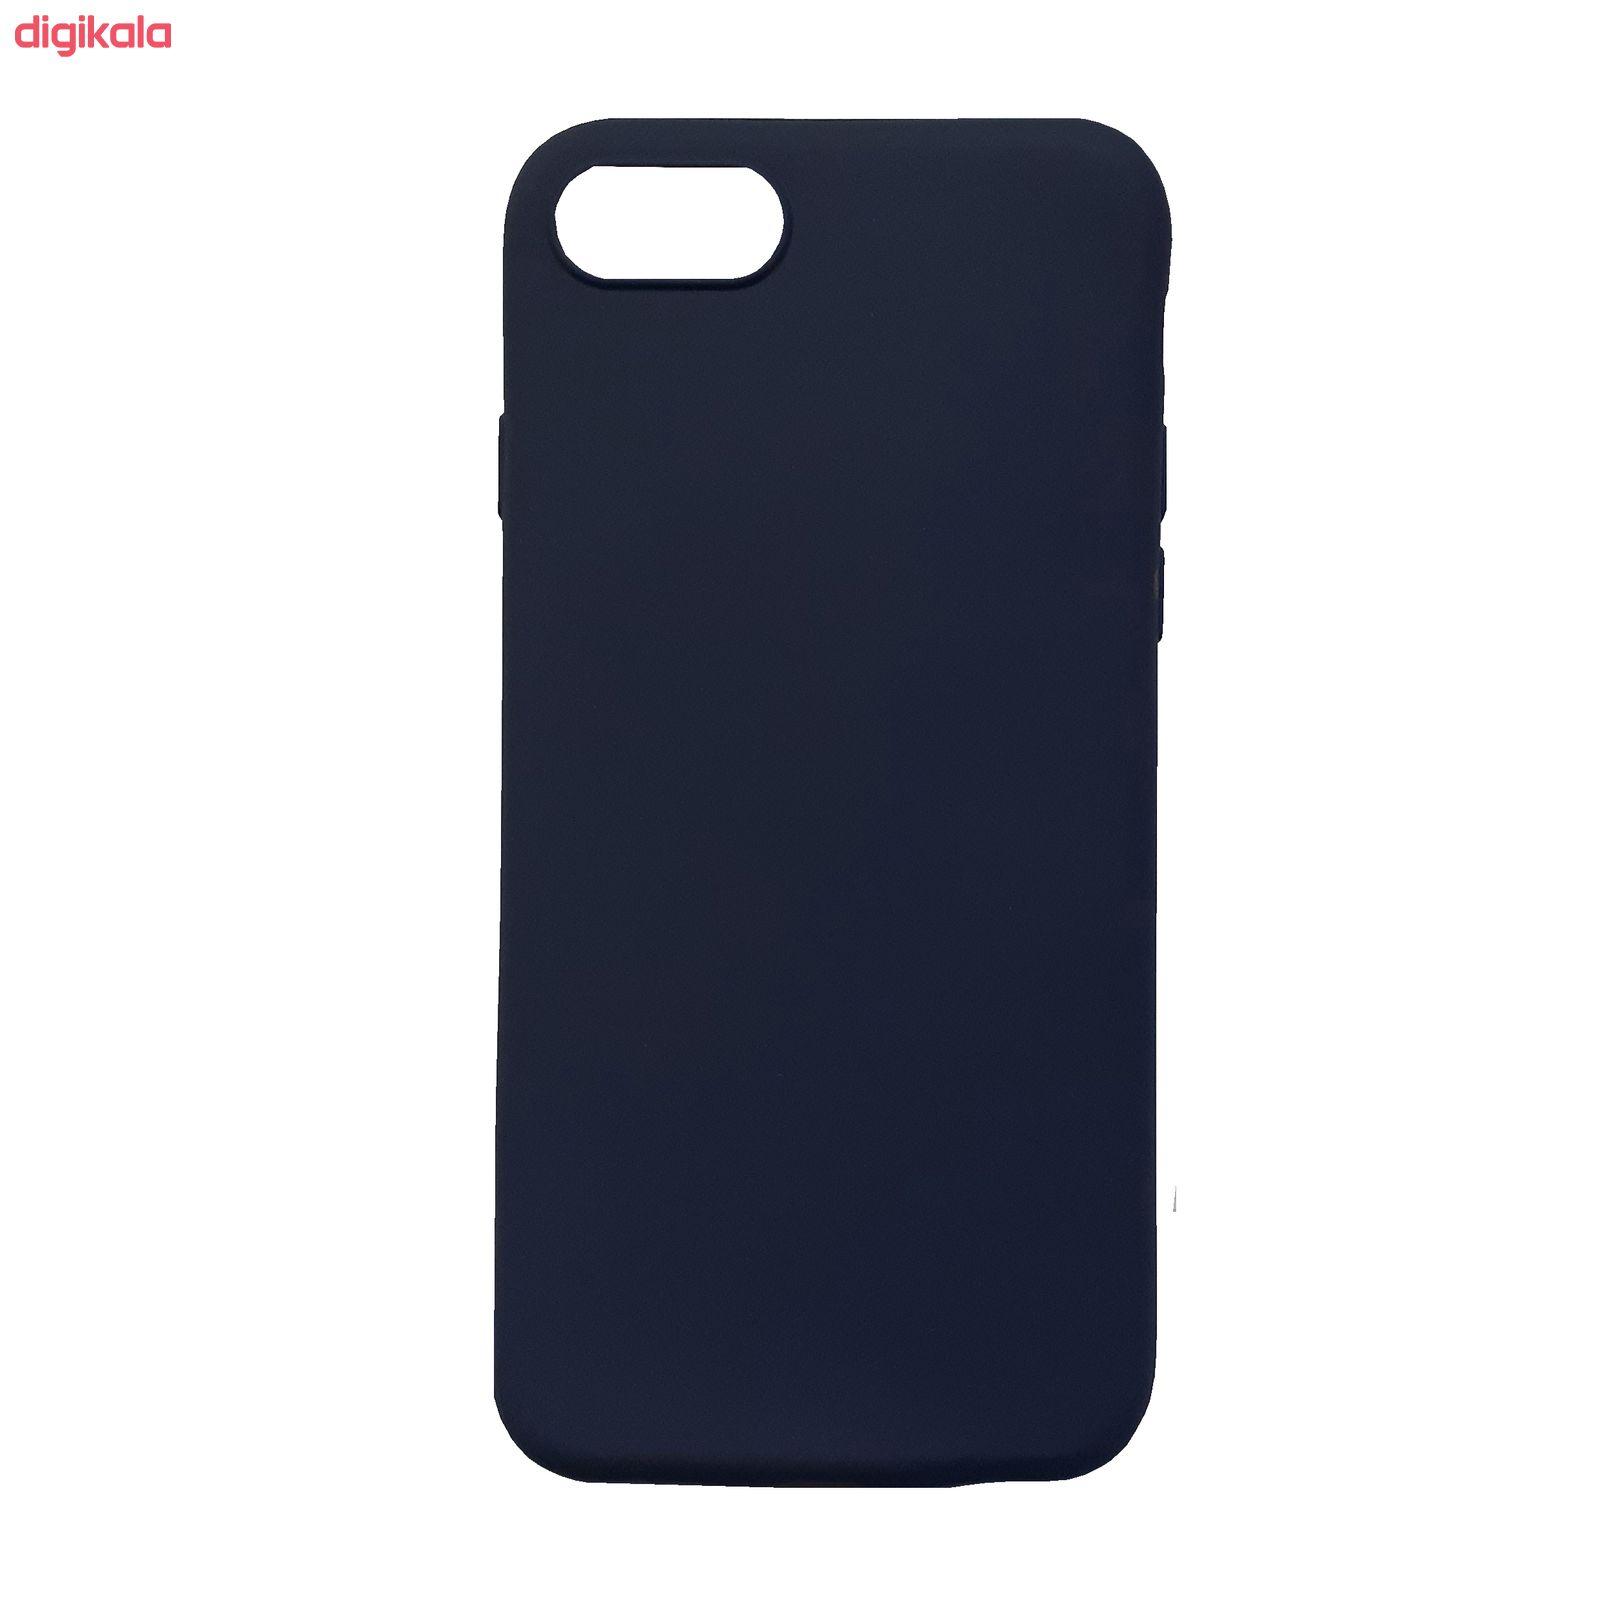 کاور مدل M-6G مناسب برای گوشی موبایل اپل iphone 6/6S main 1 5